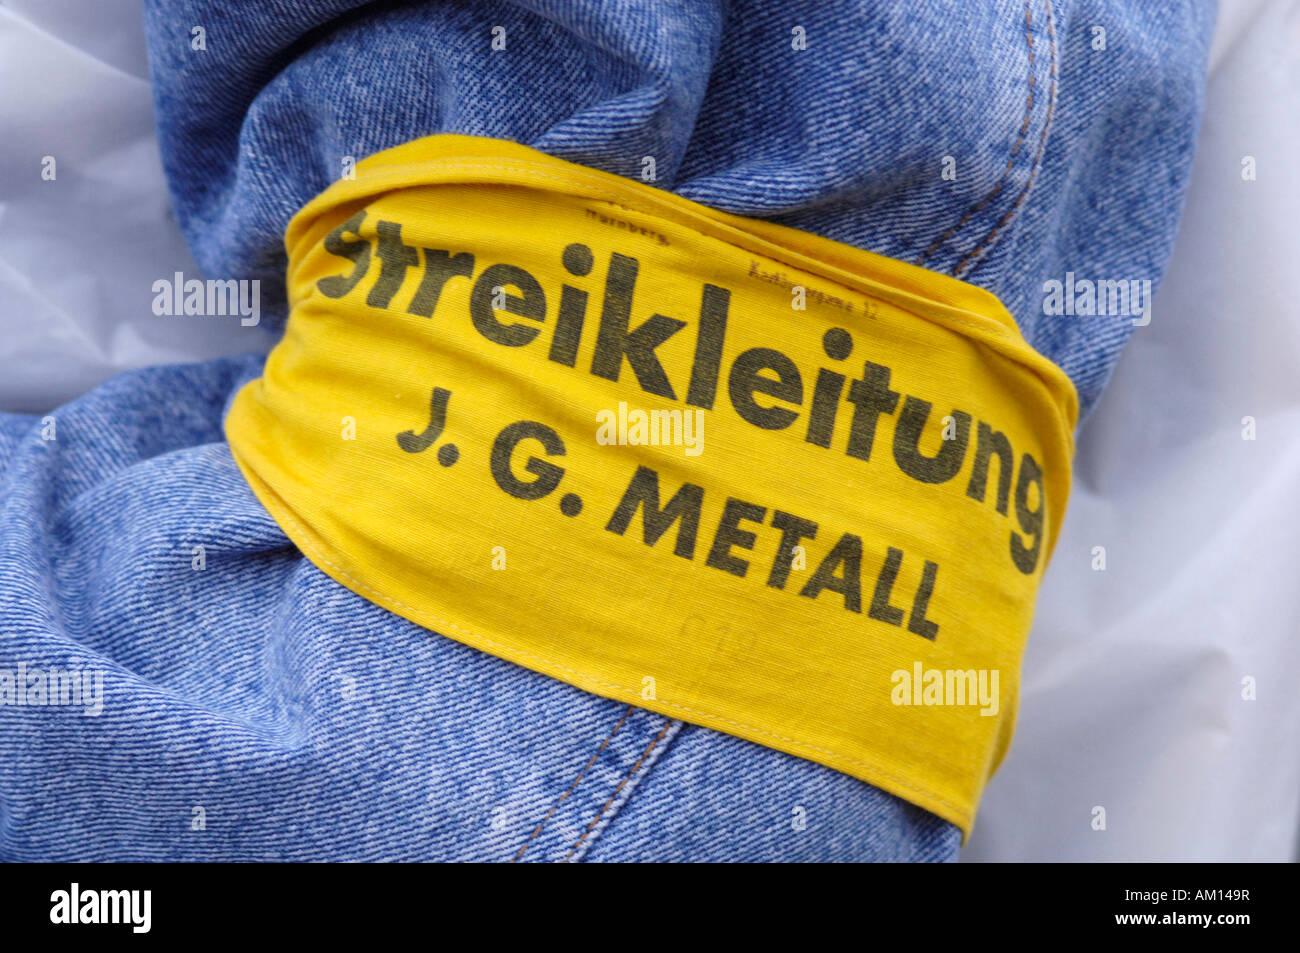 Armlet: Strike organizer in charge - IGM. - Stock Image